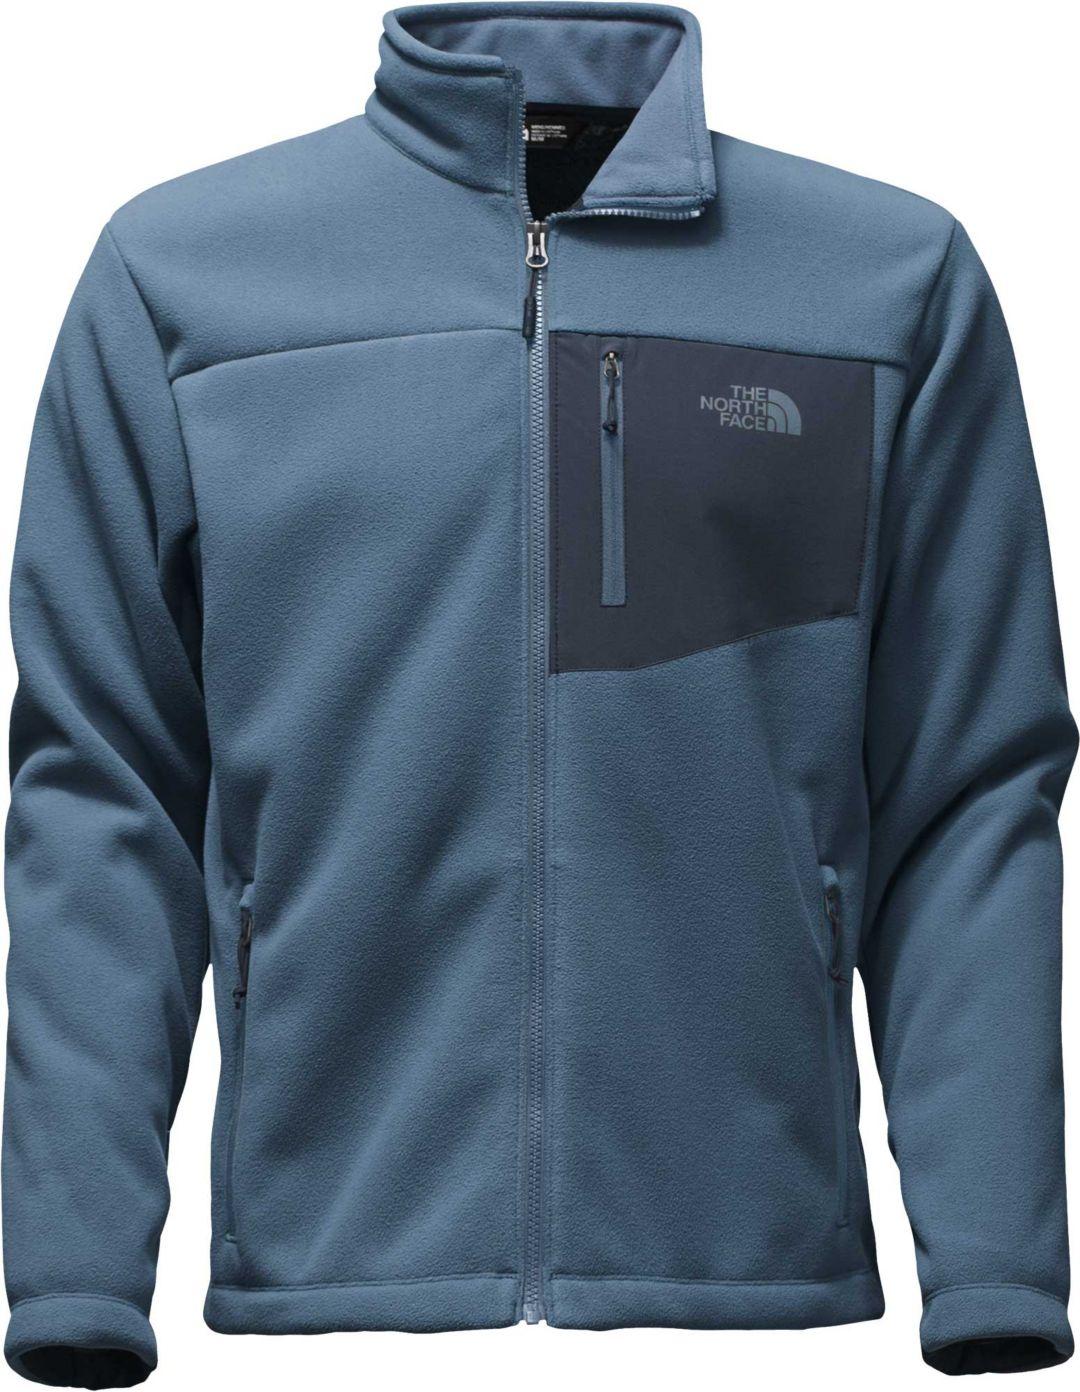 bf5275acb The North Face Men's Chimborazo Full Zip Fleece Jacket | DICK'S ...